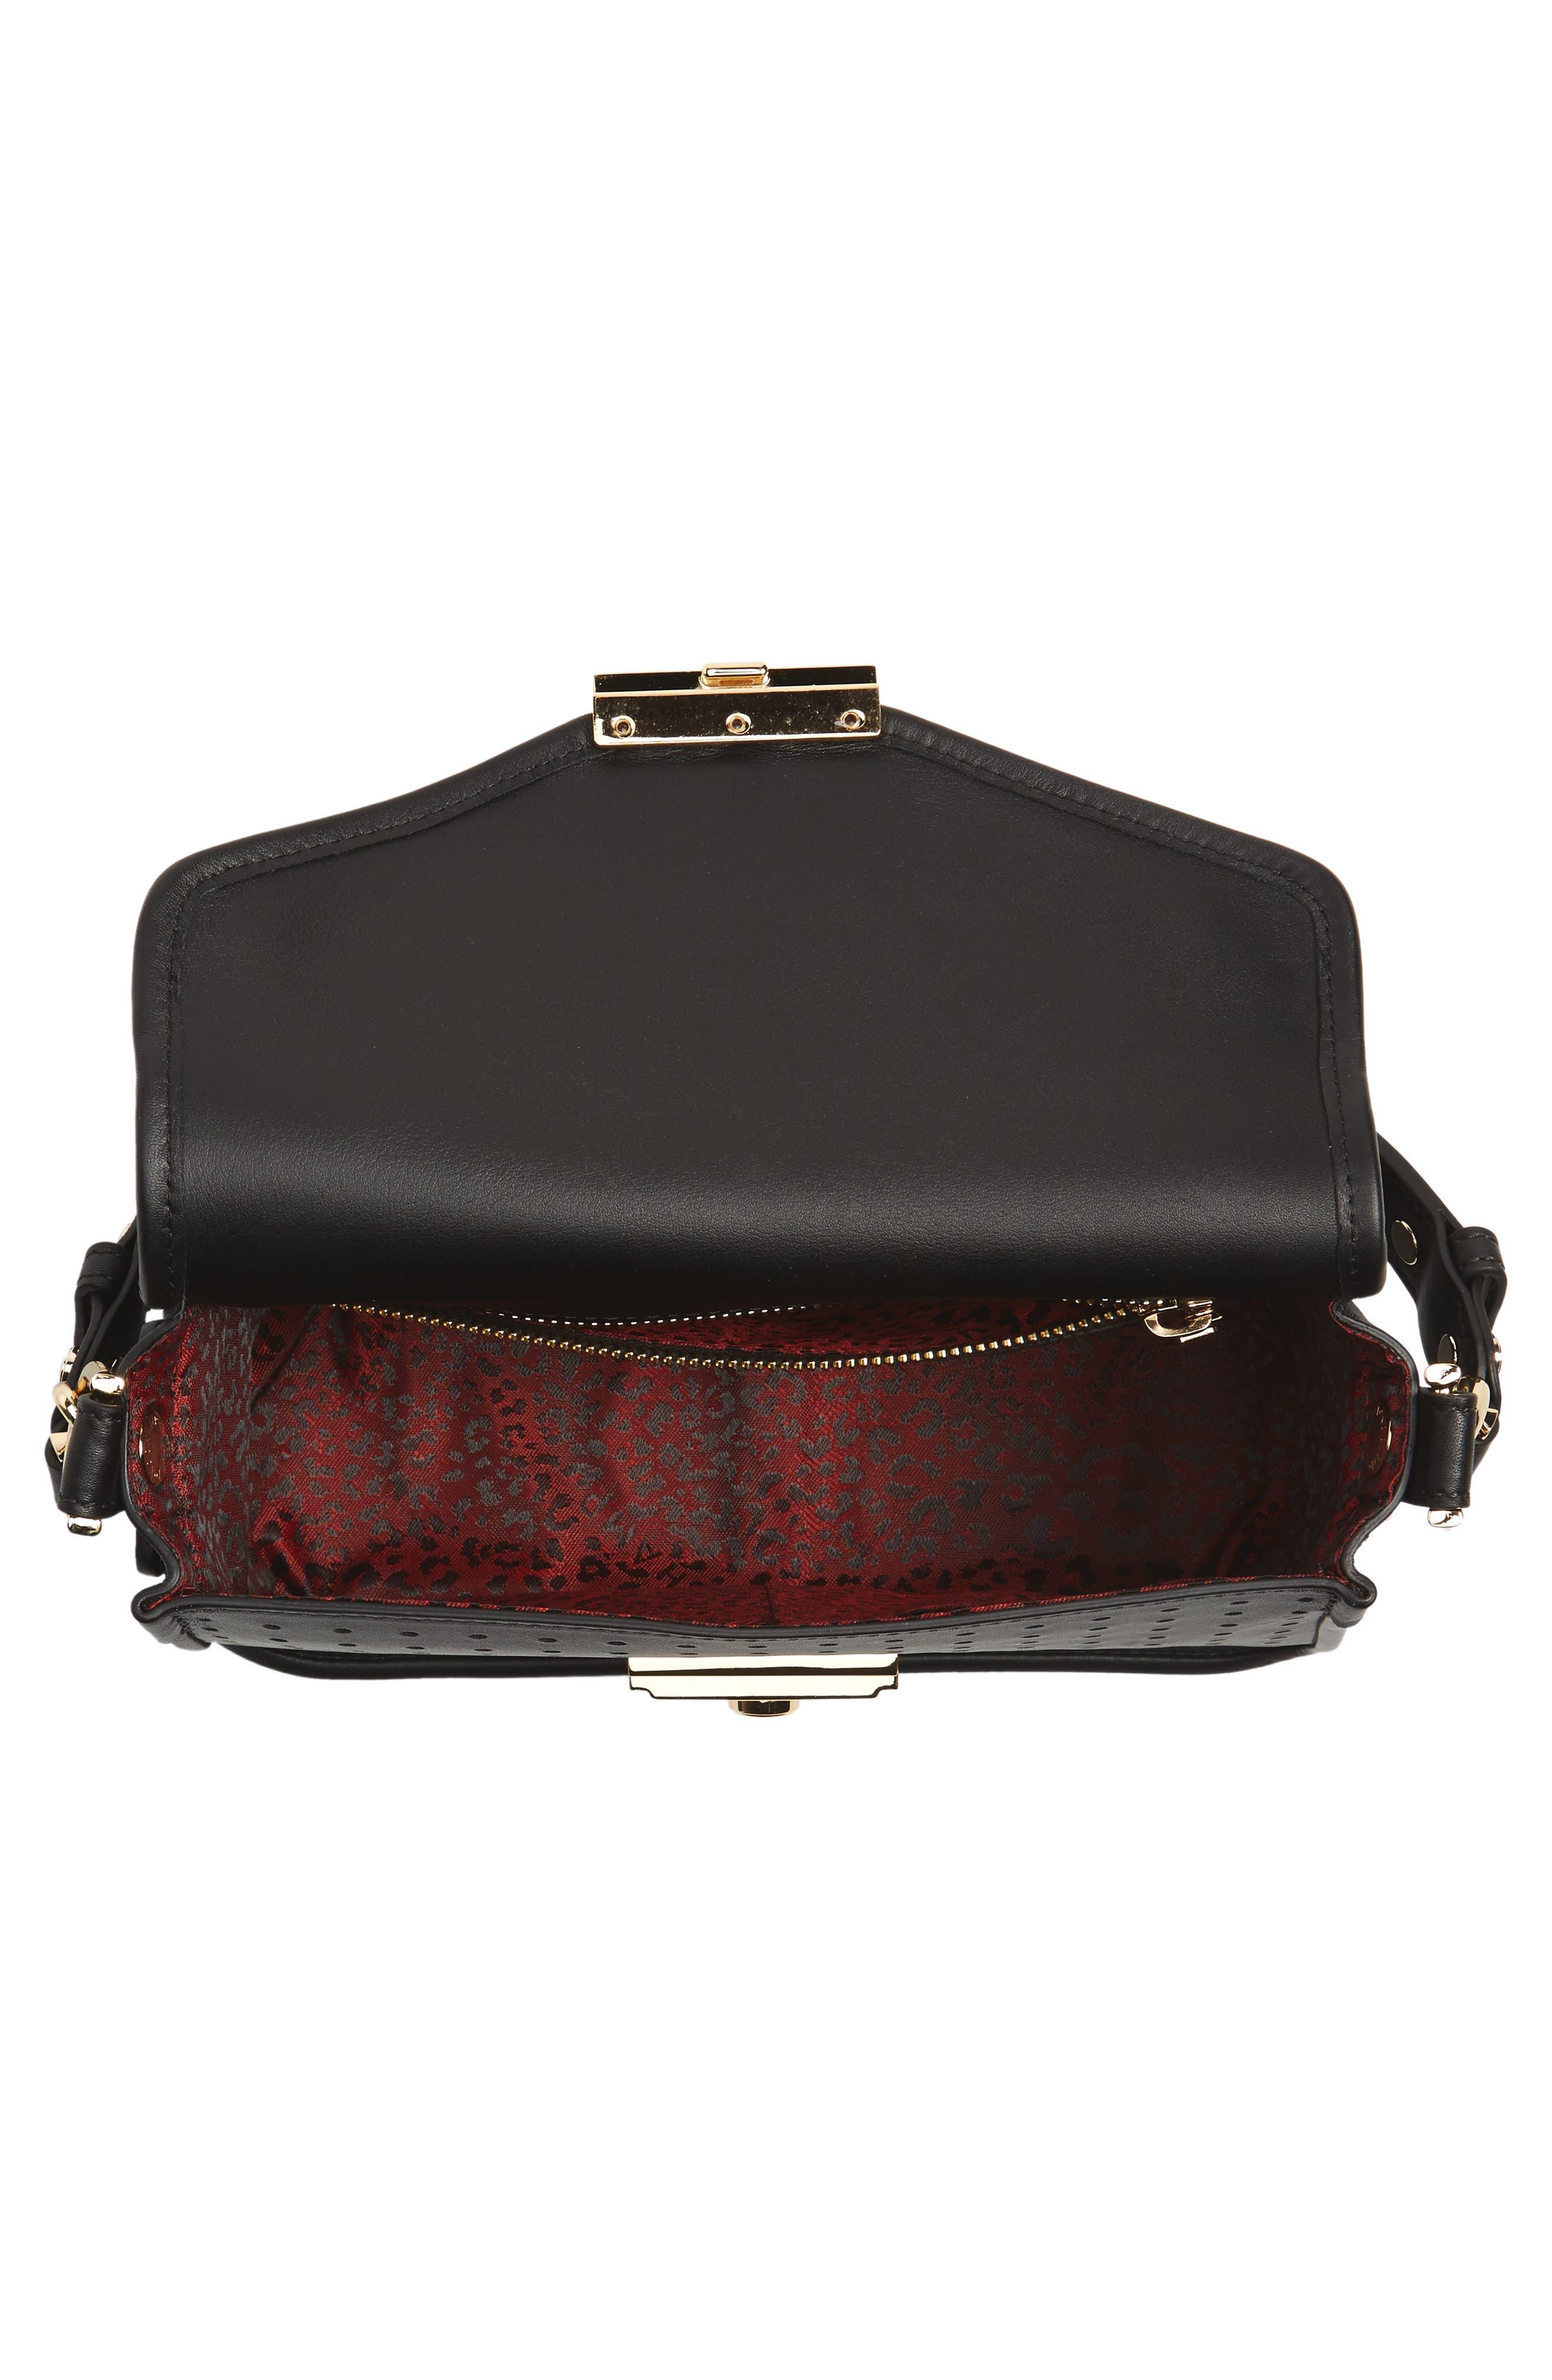 Small Mademoiselle Calfskin Leather Crossbody Bag,                             Alternate thumbnail 4, color,                             Black